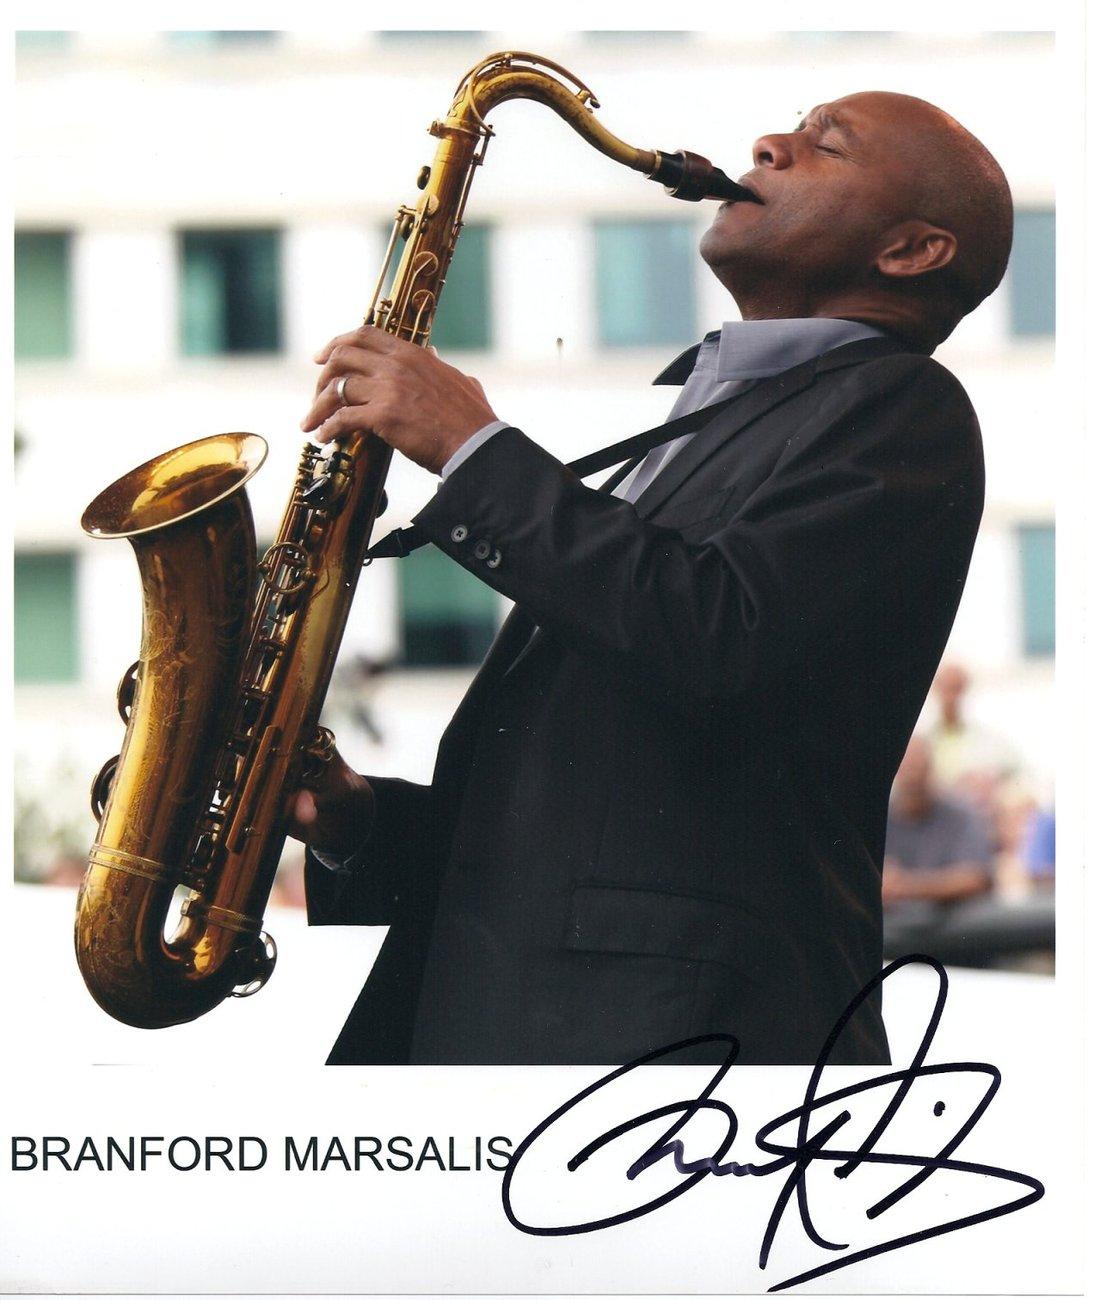 Brandfordmarsalis2710